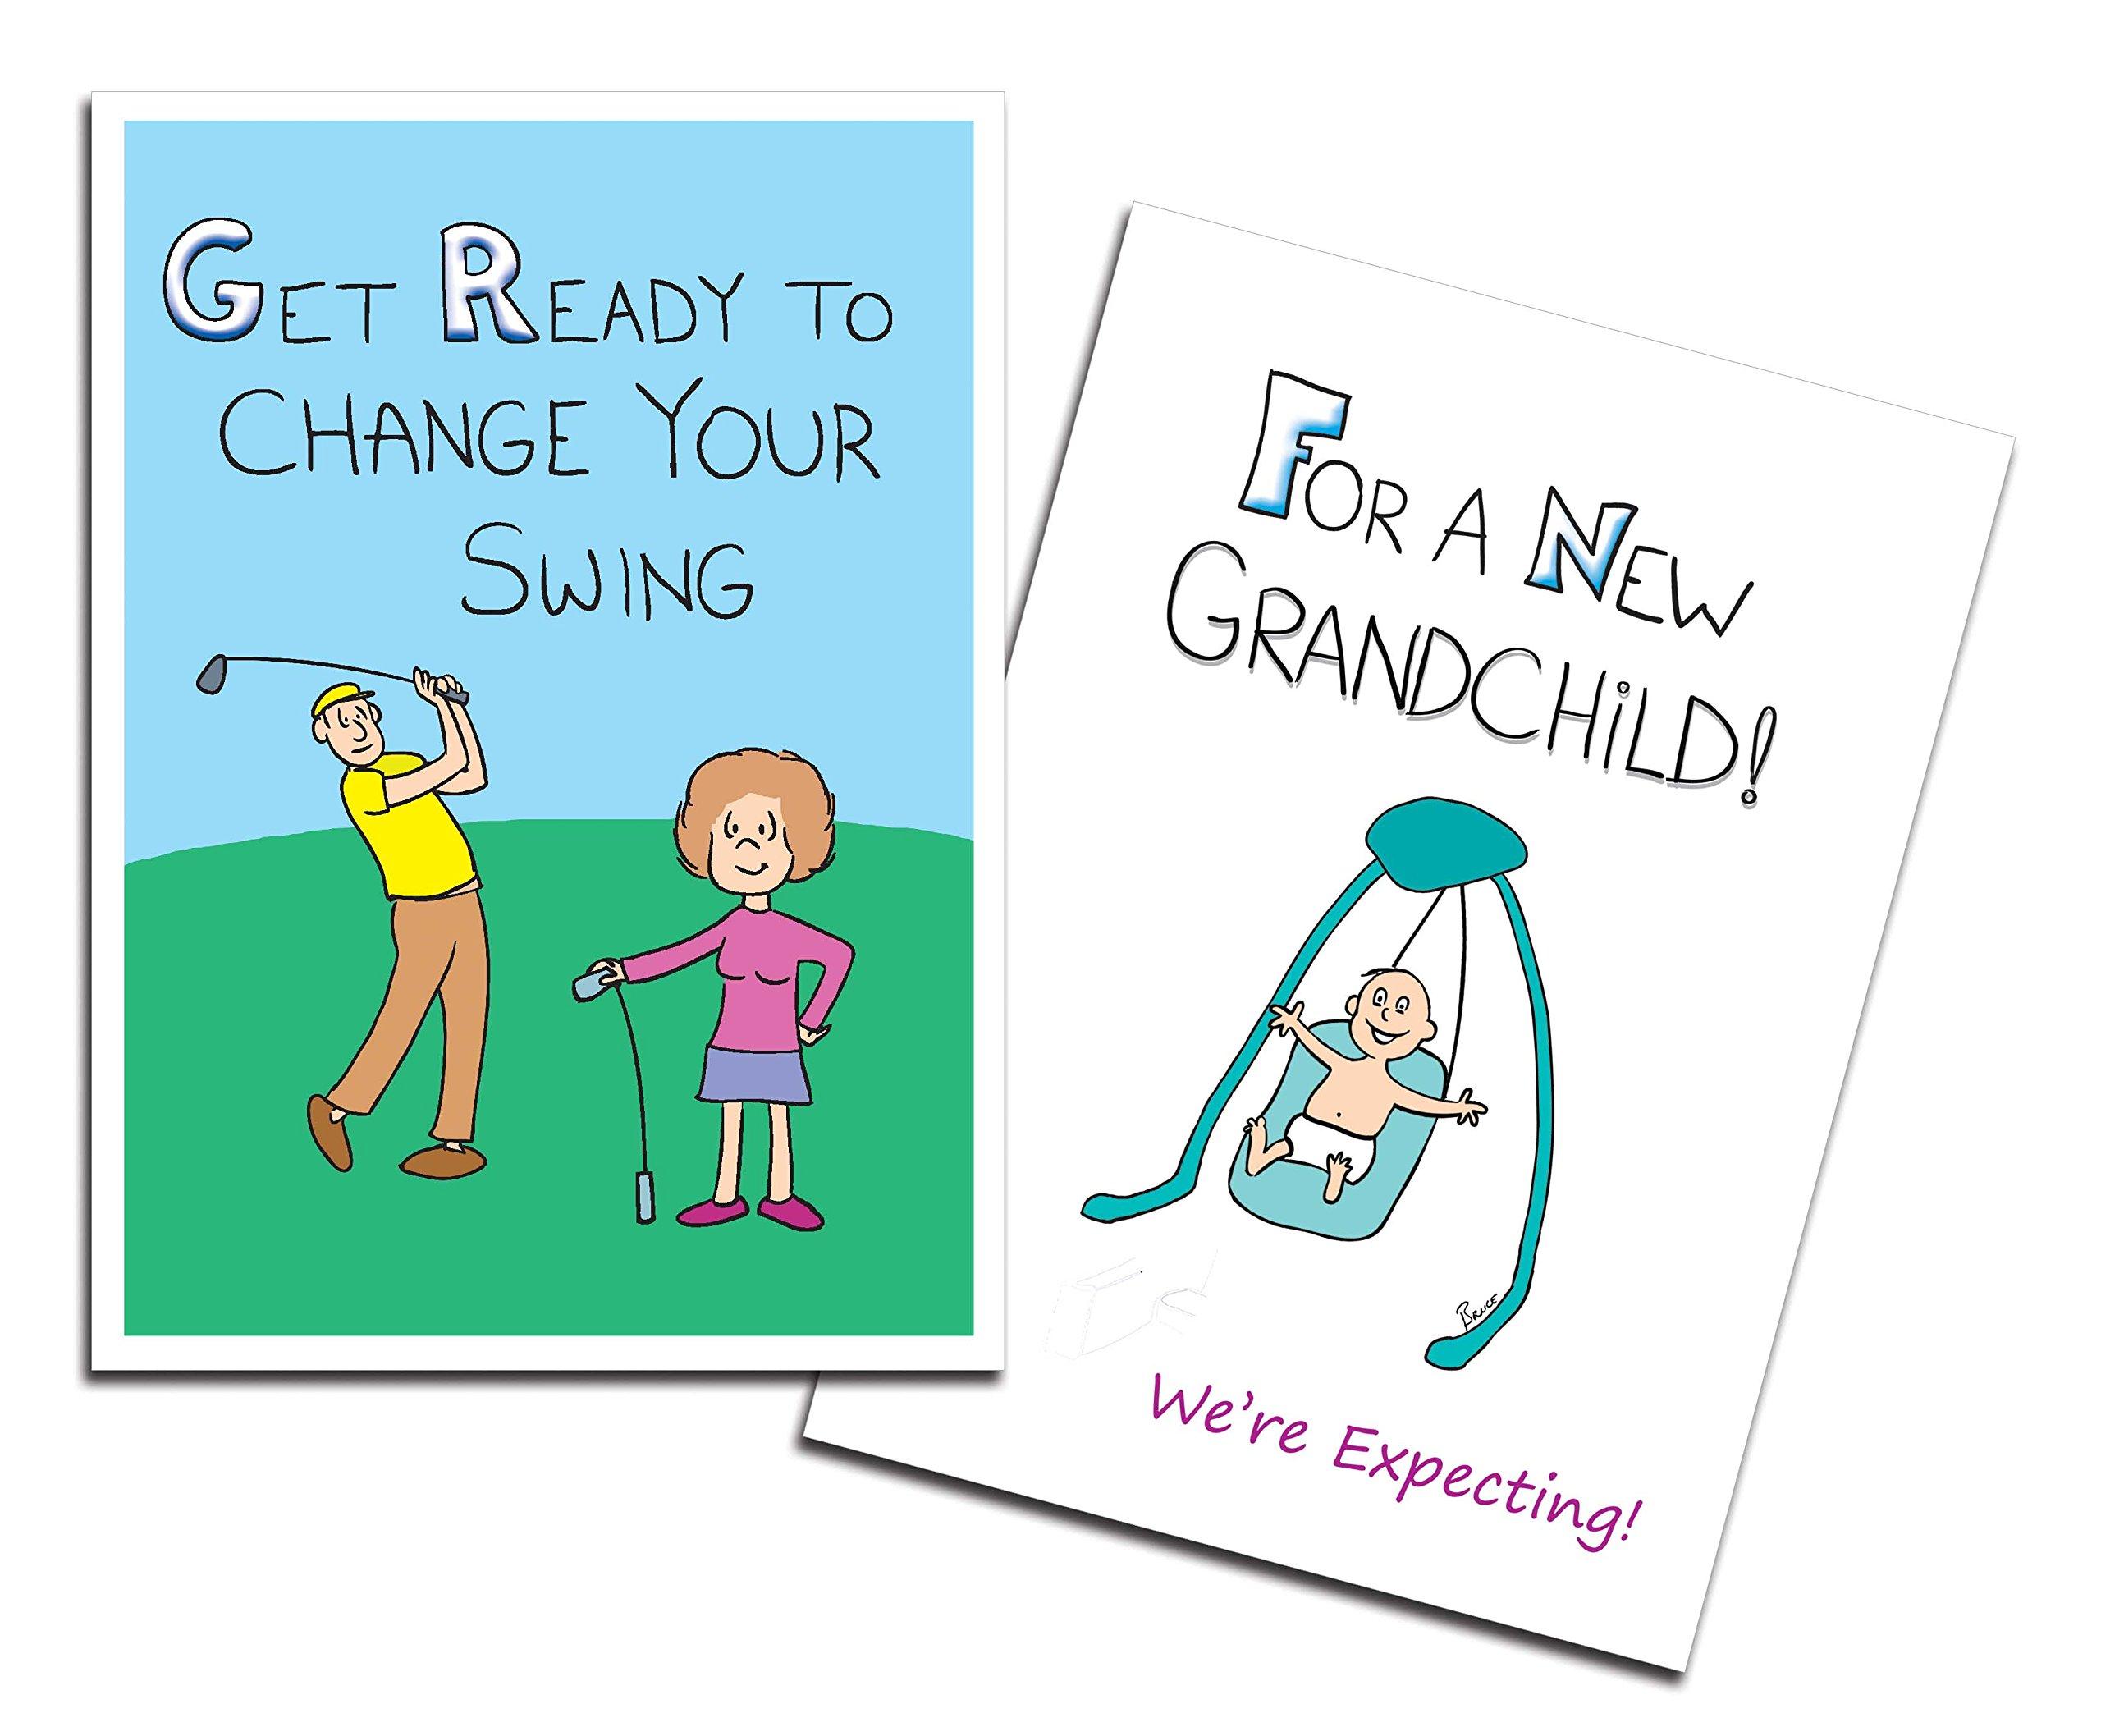 Dad's Castle Pregnancy Announcement - Grandparents Card, Changing Swing